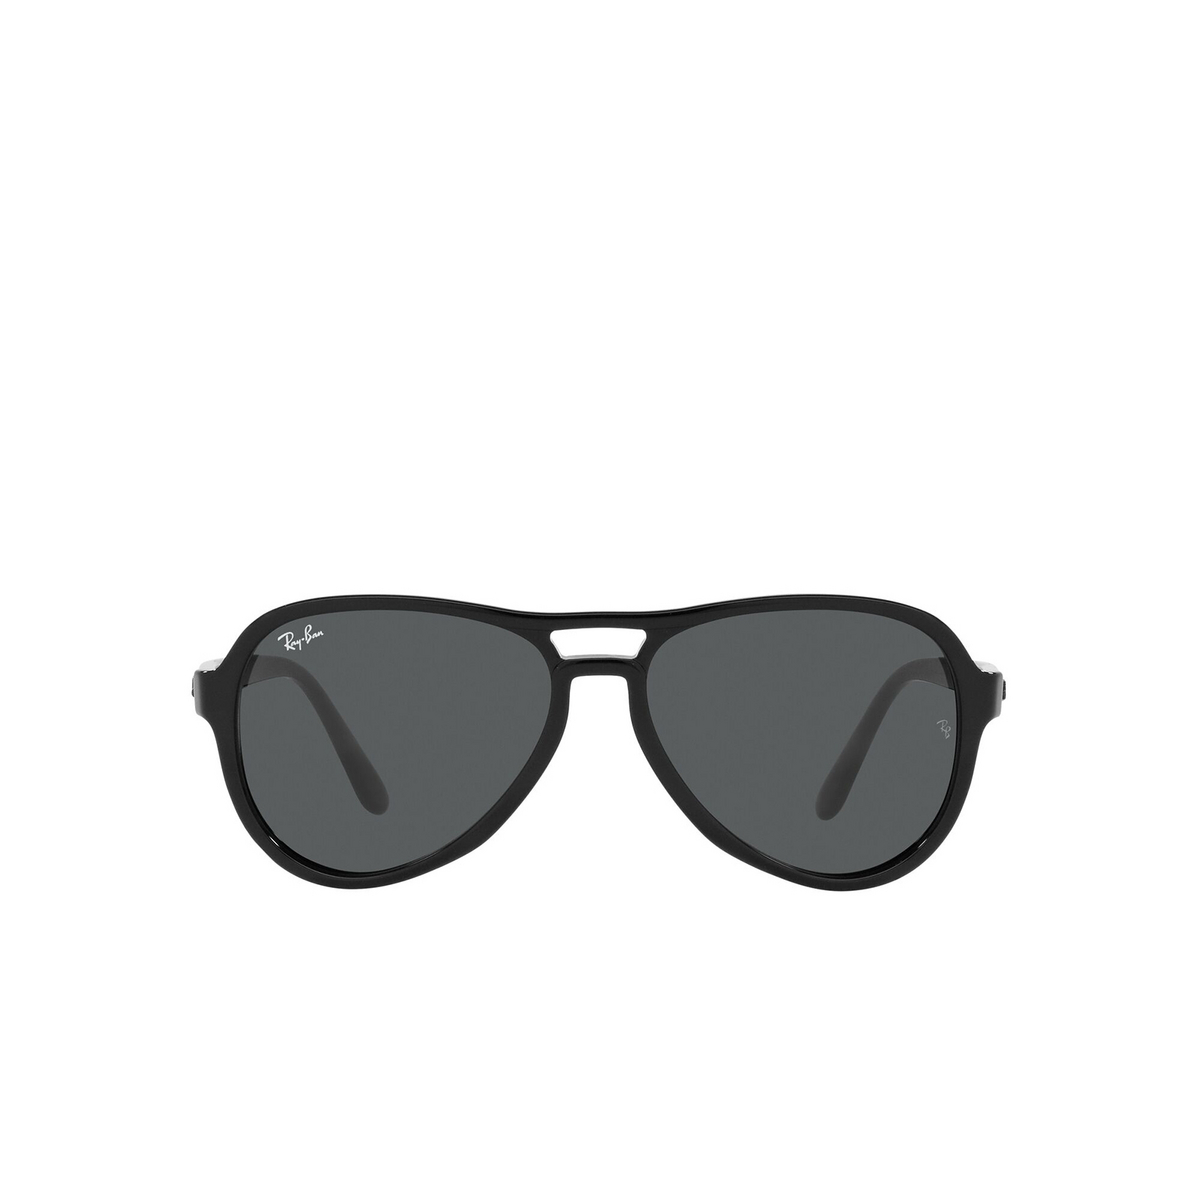 Ray-Ban® Aviator Sunglasses: Vagabond RB4355 color Black 601/B1 - front view.